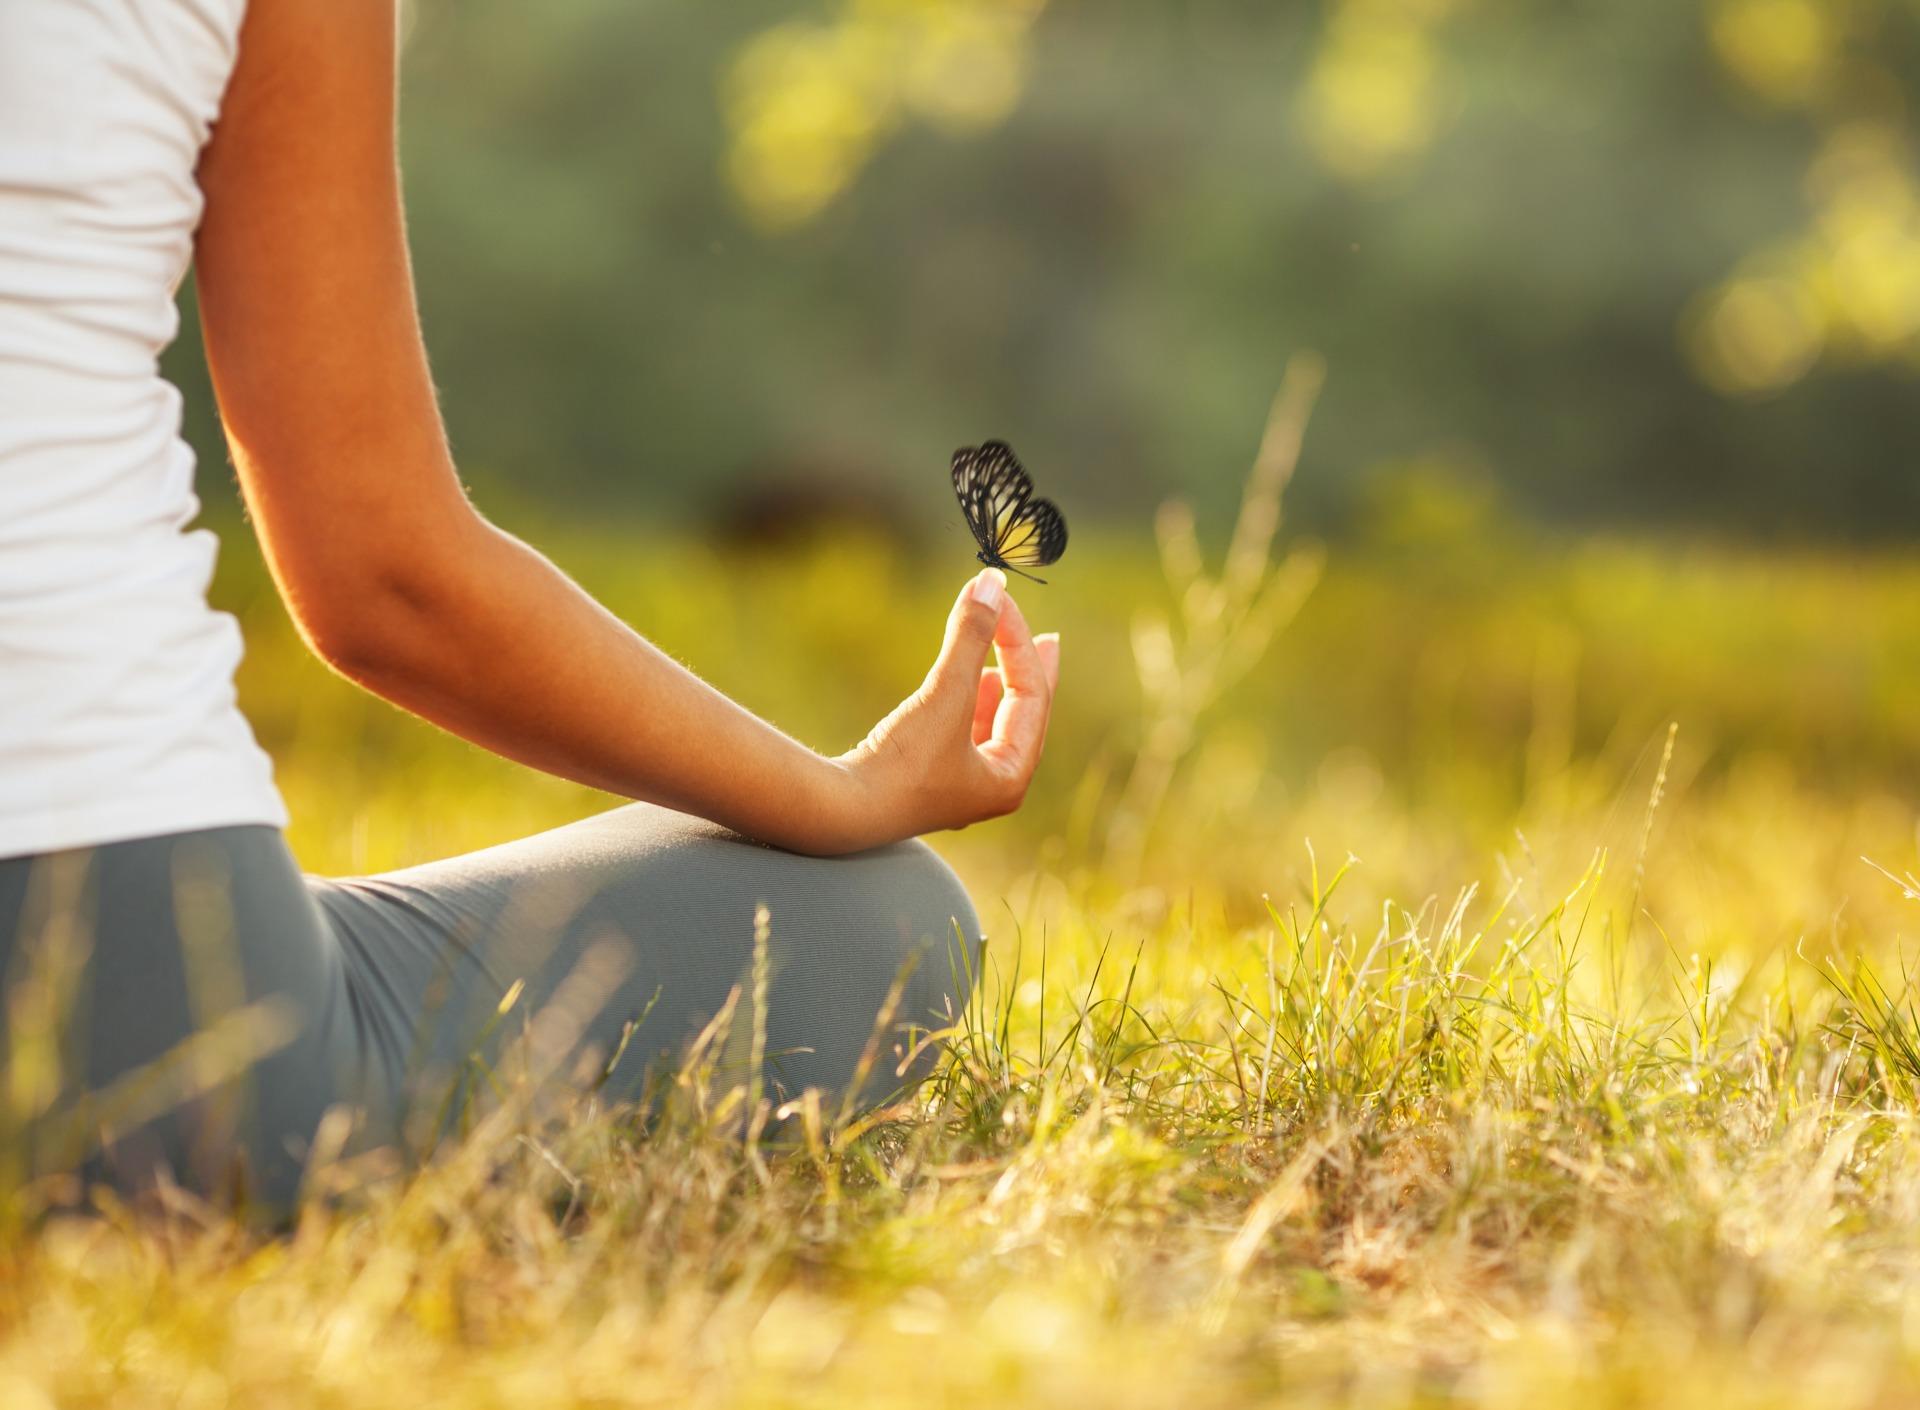 Równowaga i harmonia